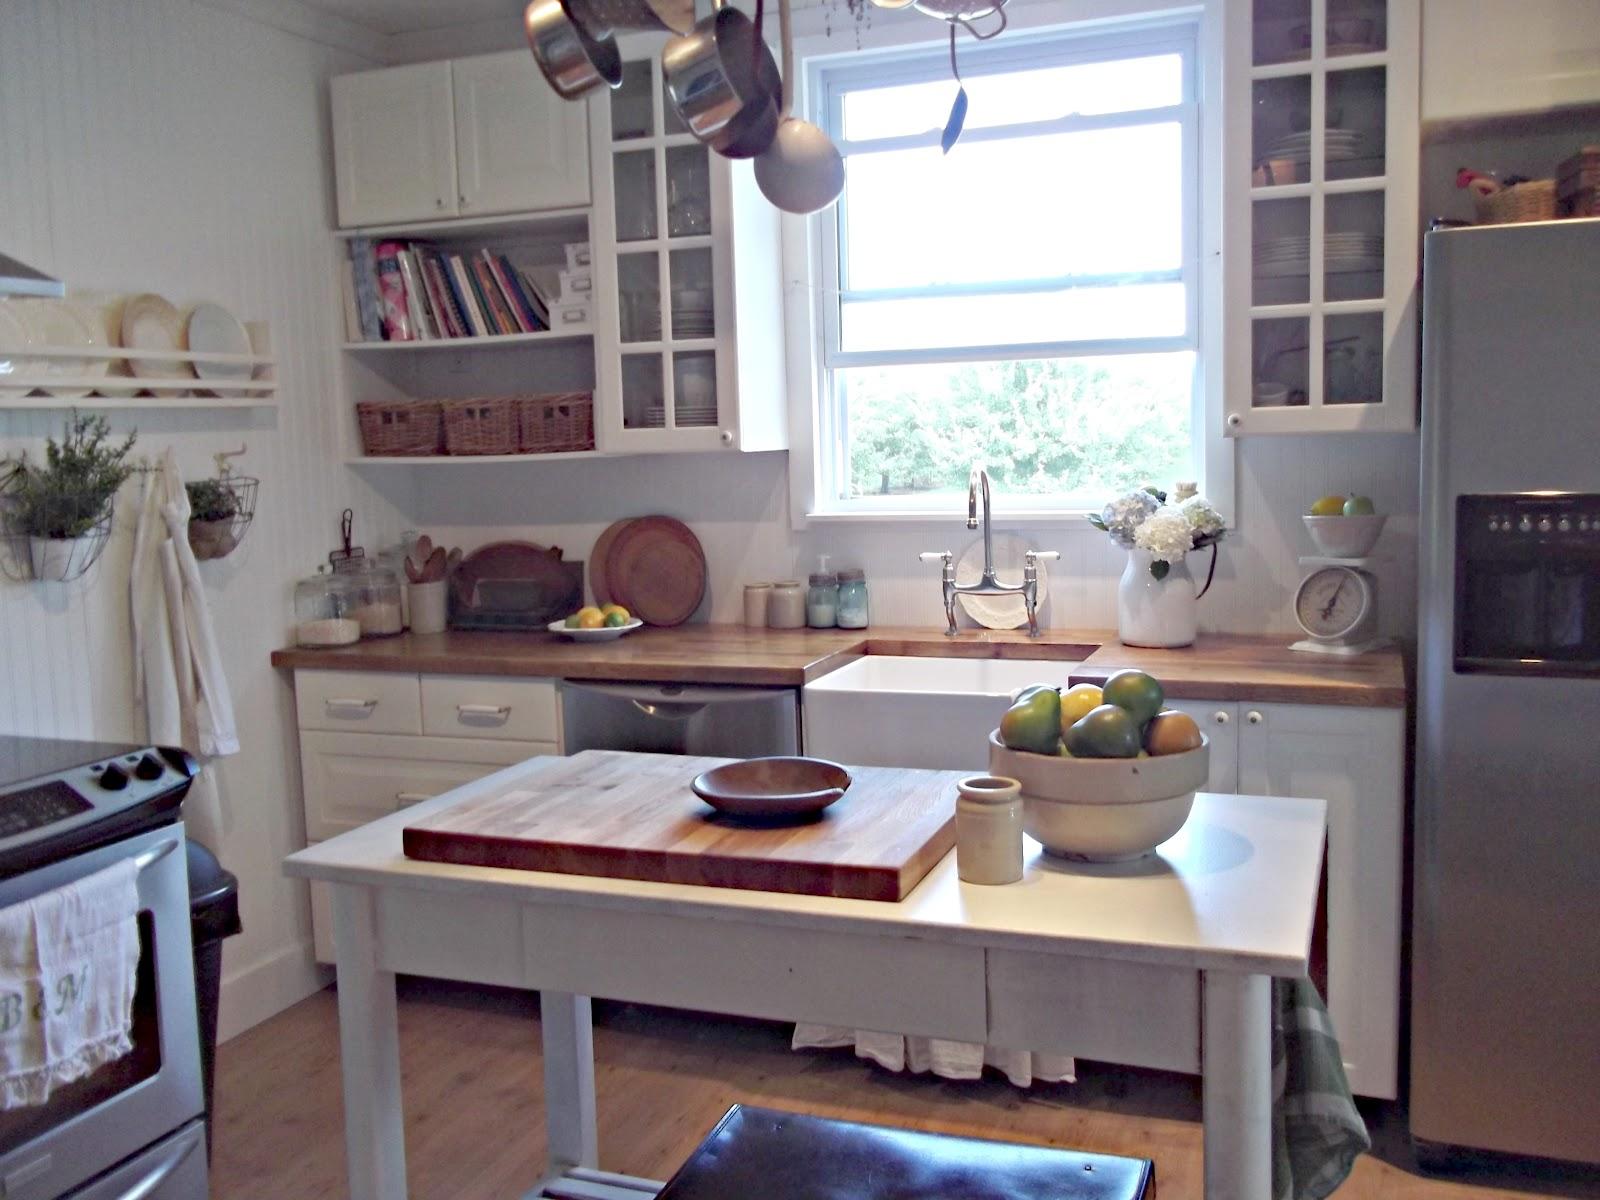 Rustic Farmhouse: A Farm Style Sink on Rustic Farmhouse Kitchen  id=57145